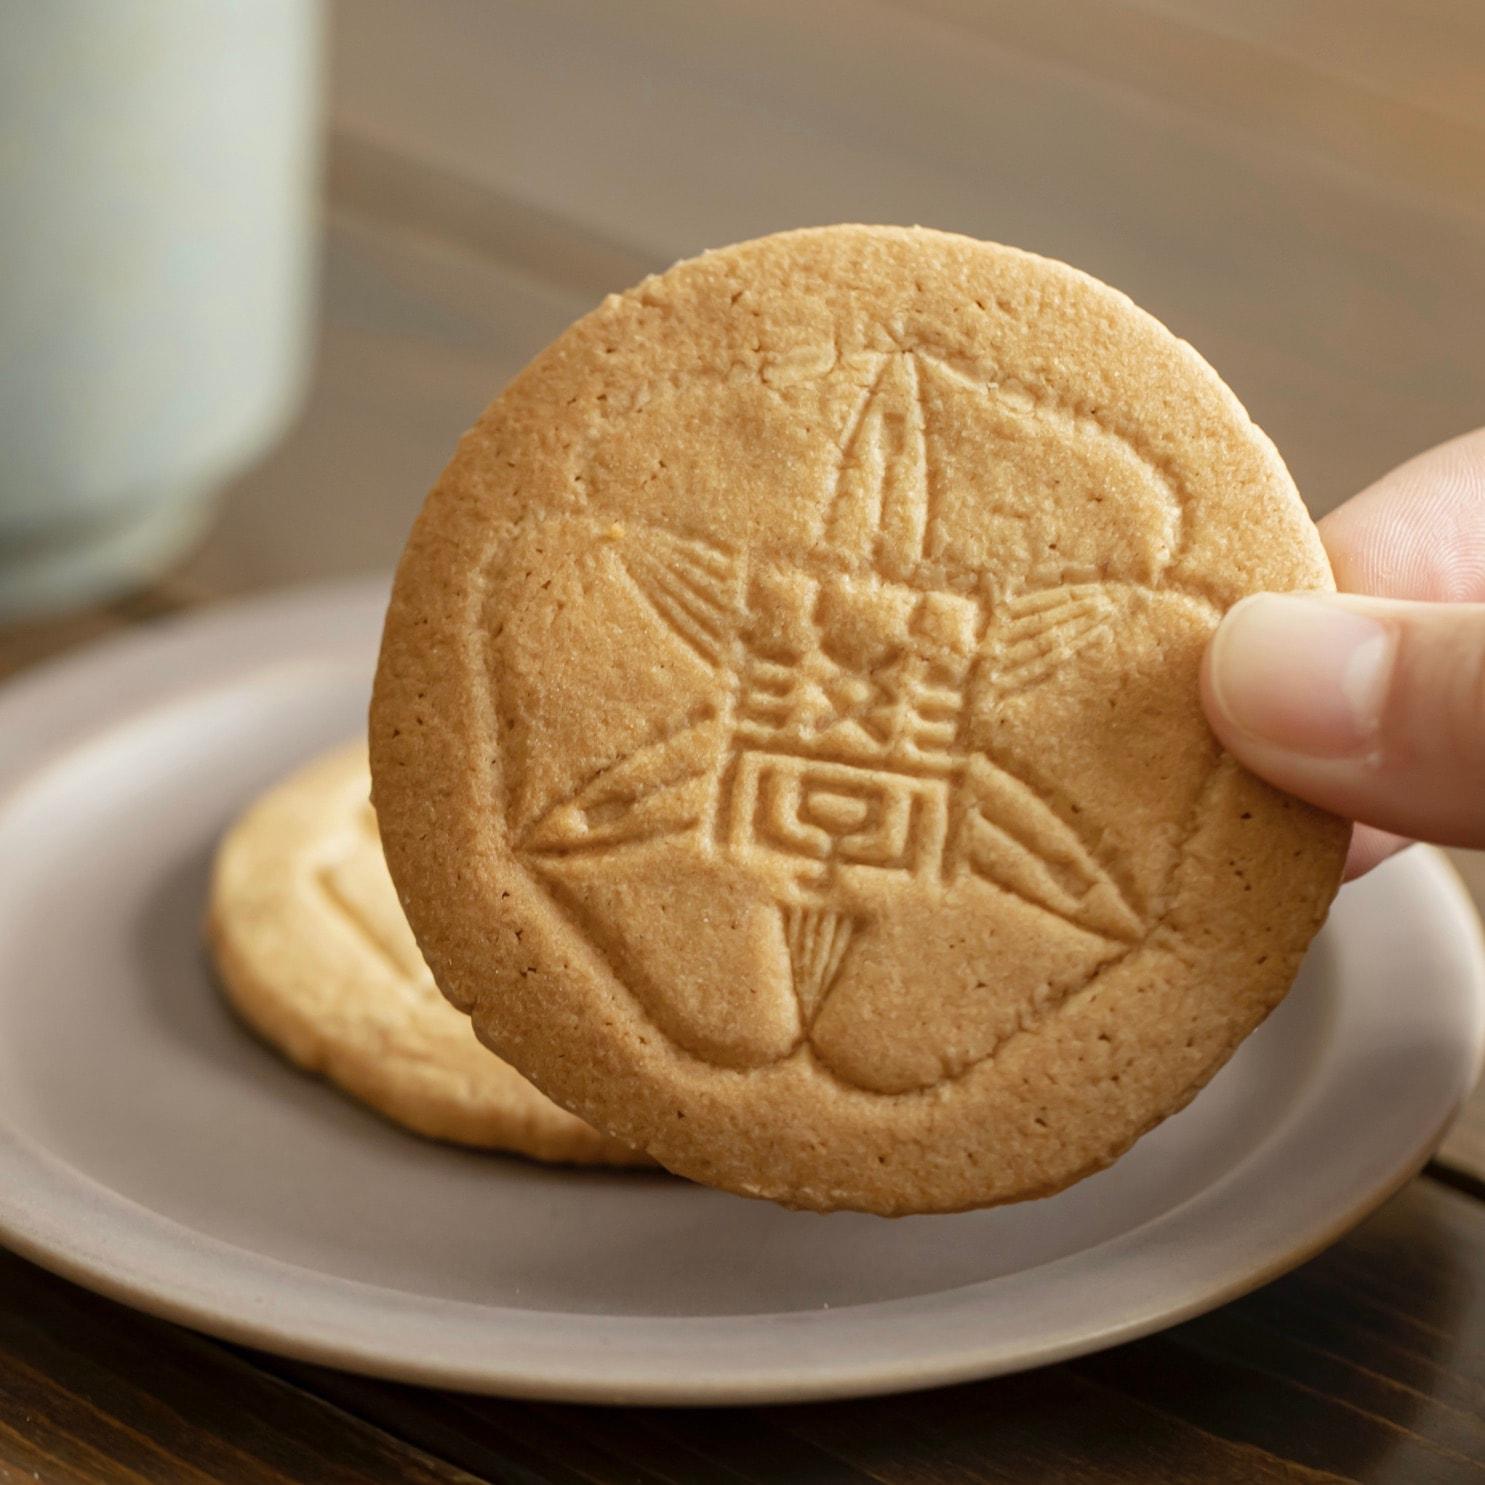 HOKUDAI Clark's Milk クッキー,北大牛乳を使って作るクッキー